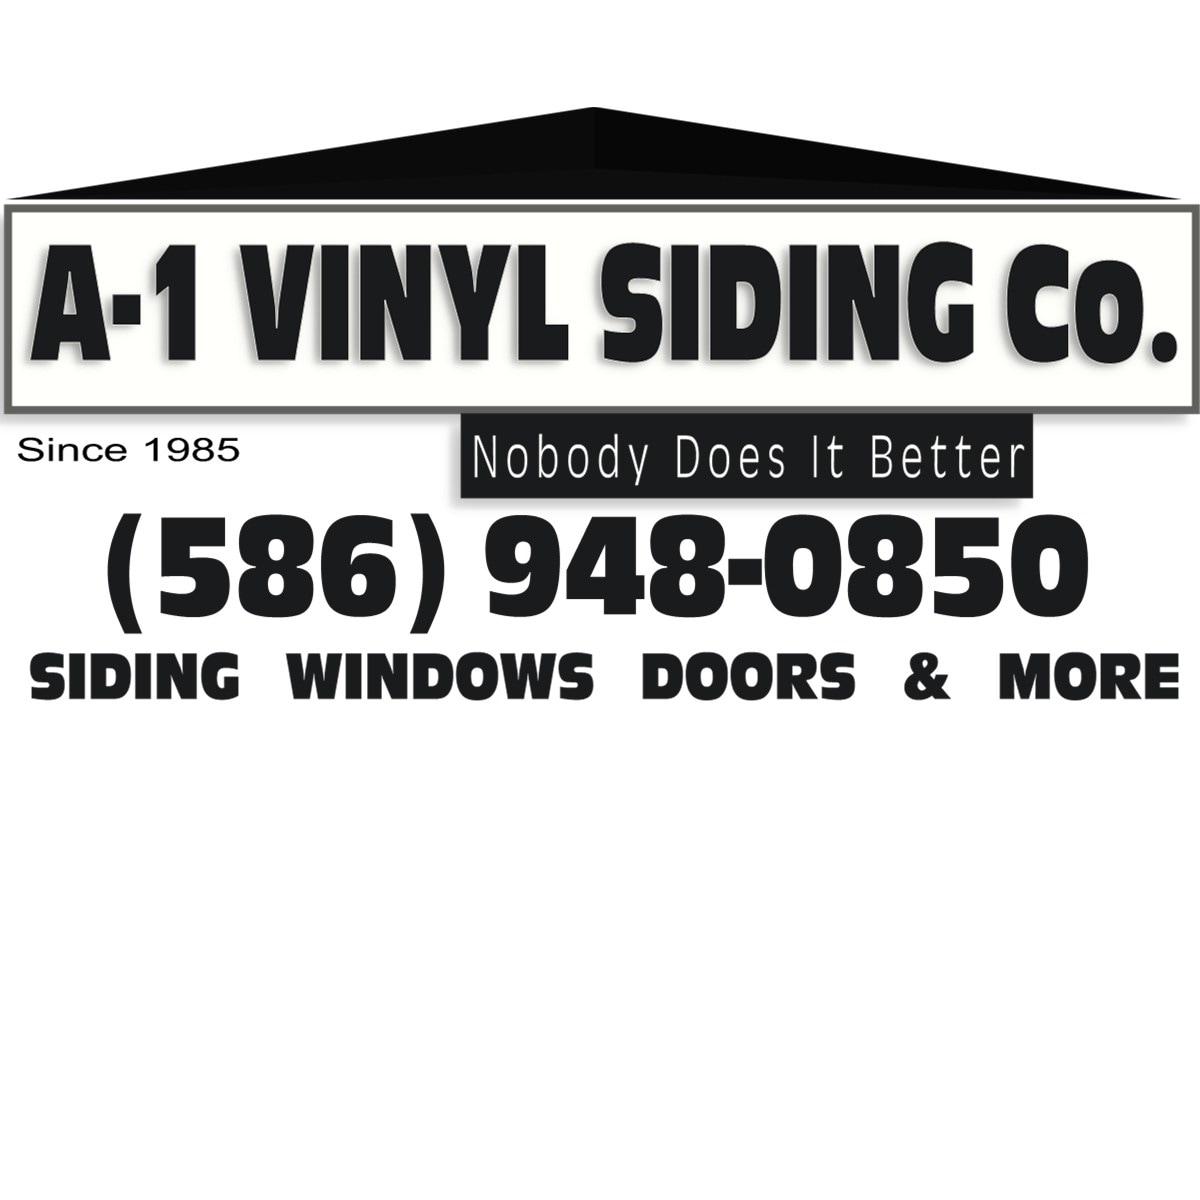 A-1 Vinyl Siding Co Inc logo